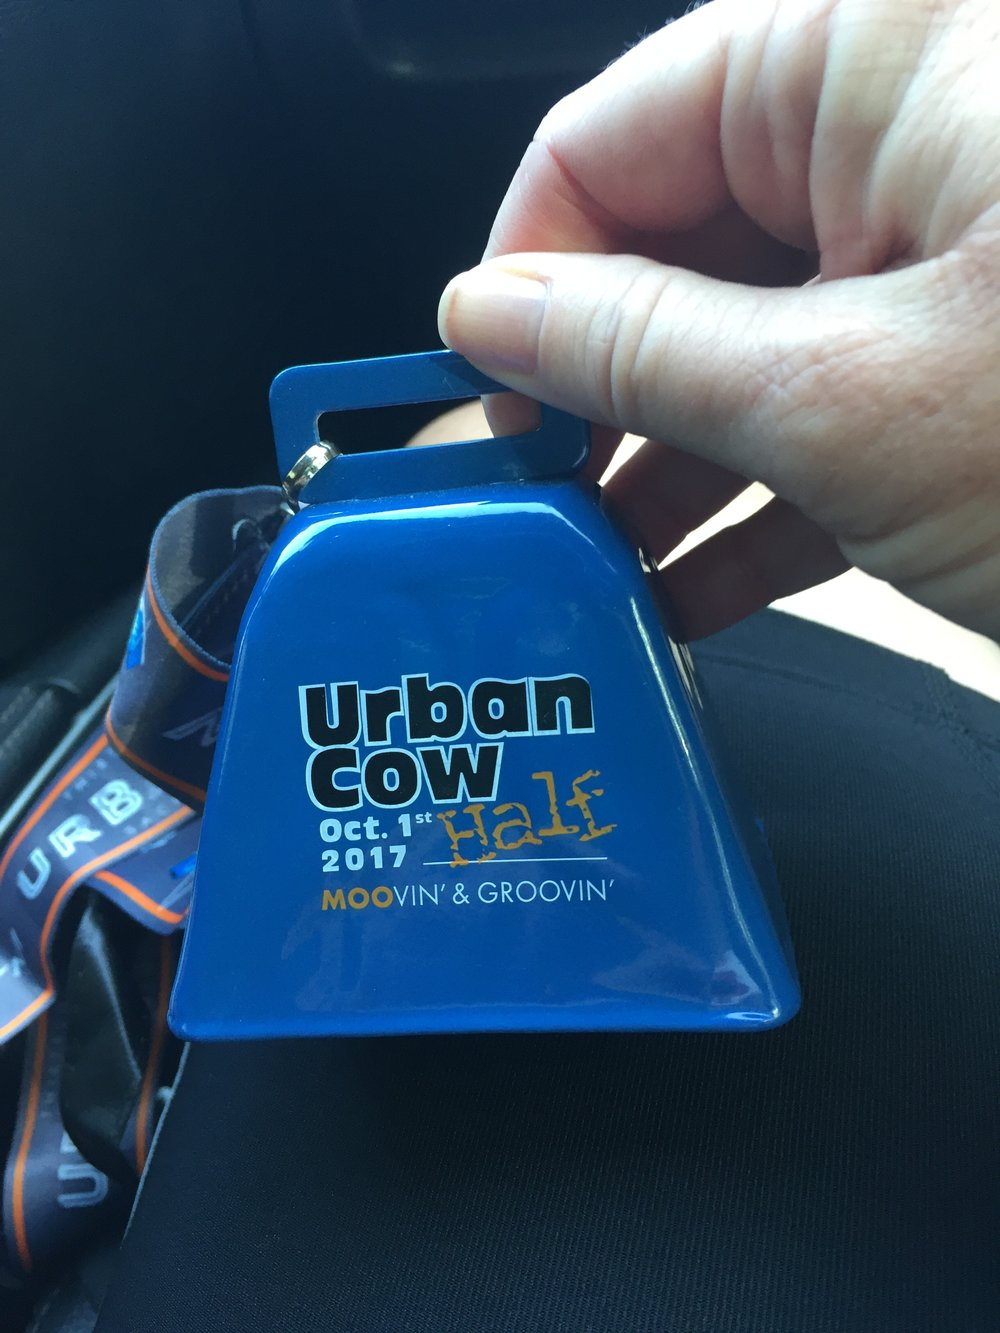 urban cow bell.JPG